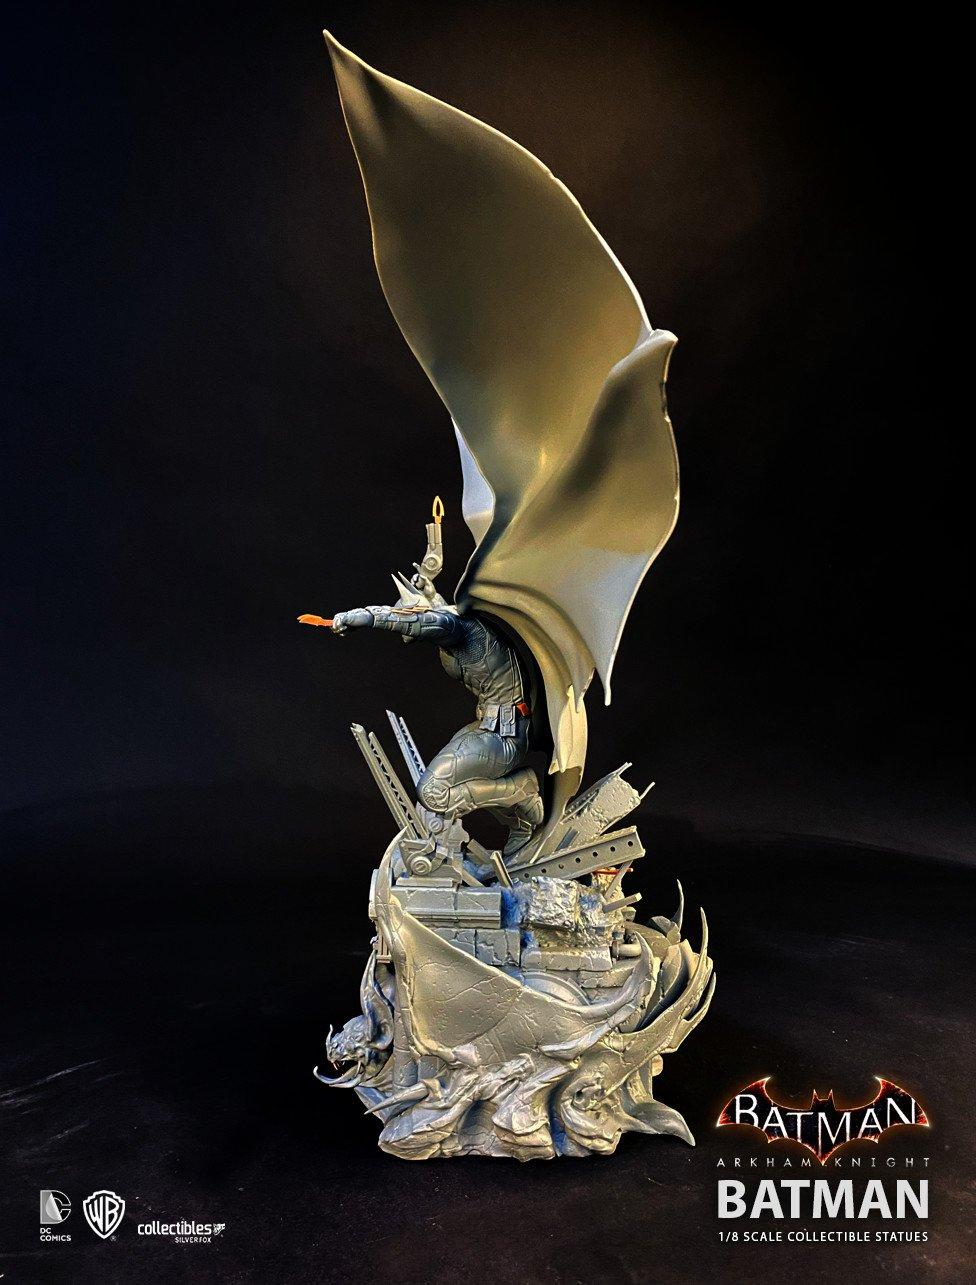 Batman siver fox collectibles batman arkham knight 1 8 scale statue1